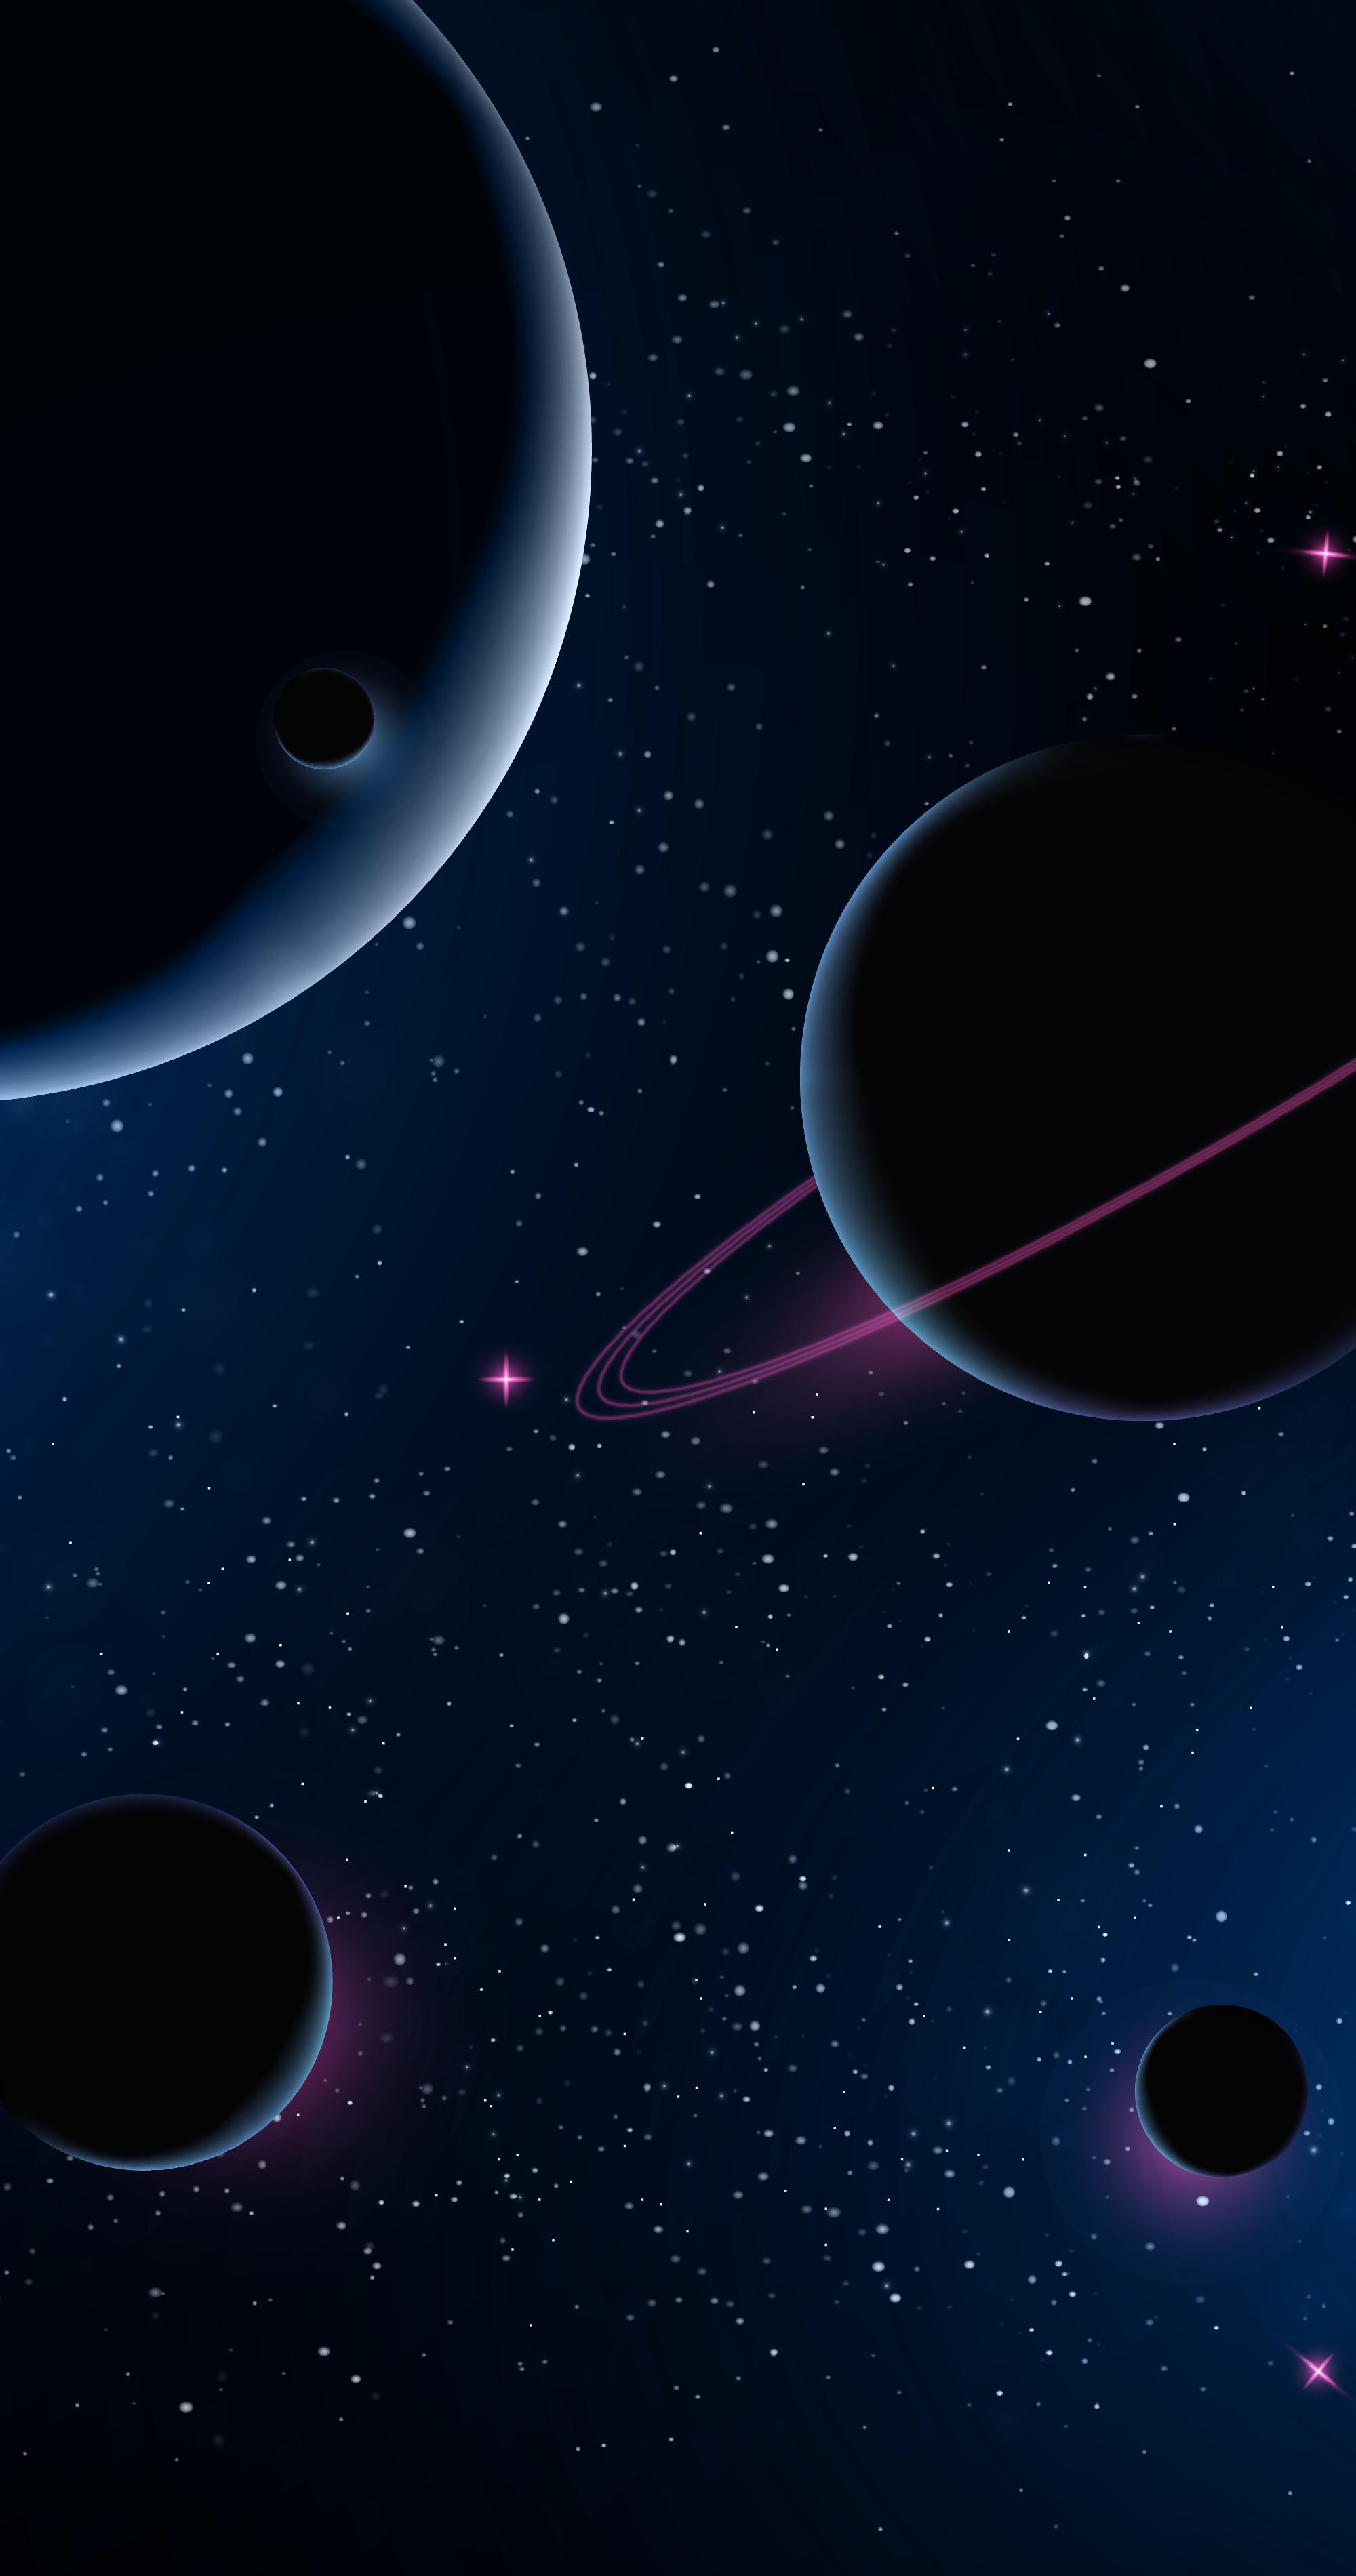 Black Space Heroscreen Cool Wallpapers